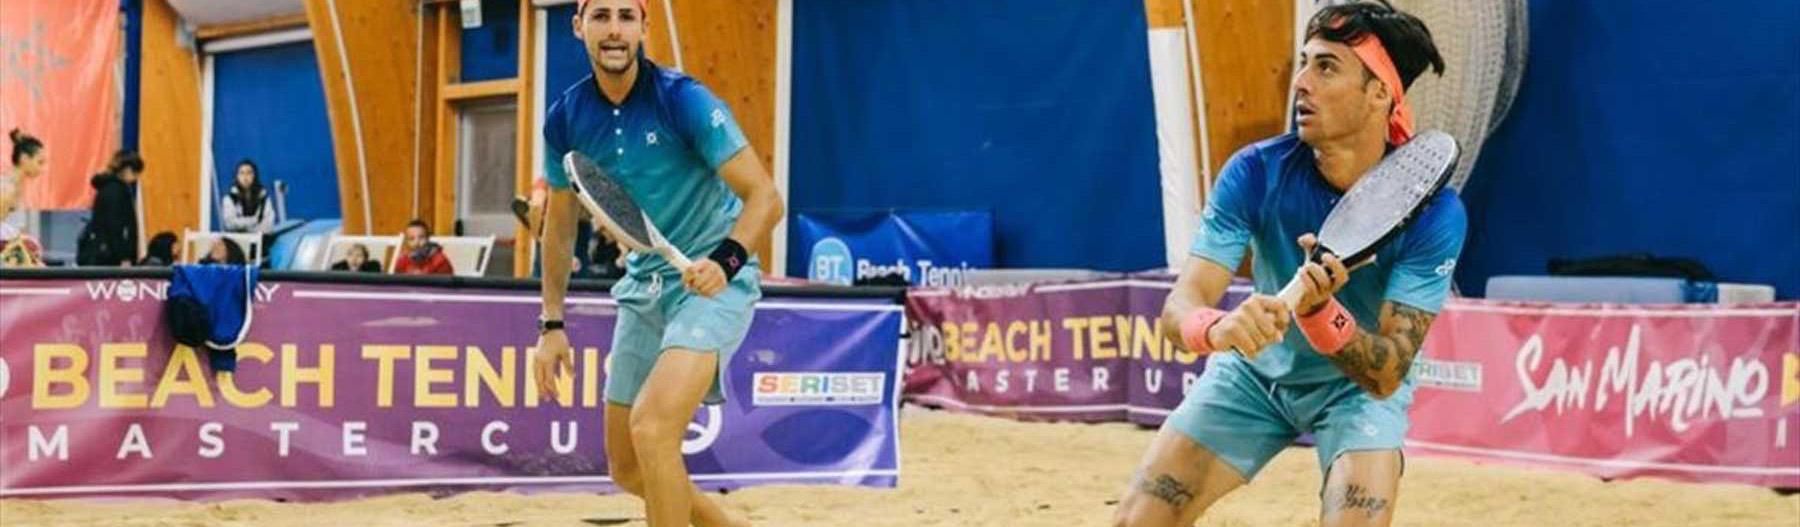 BEACH TENNIS Take Care Sport Center